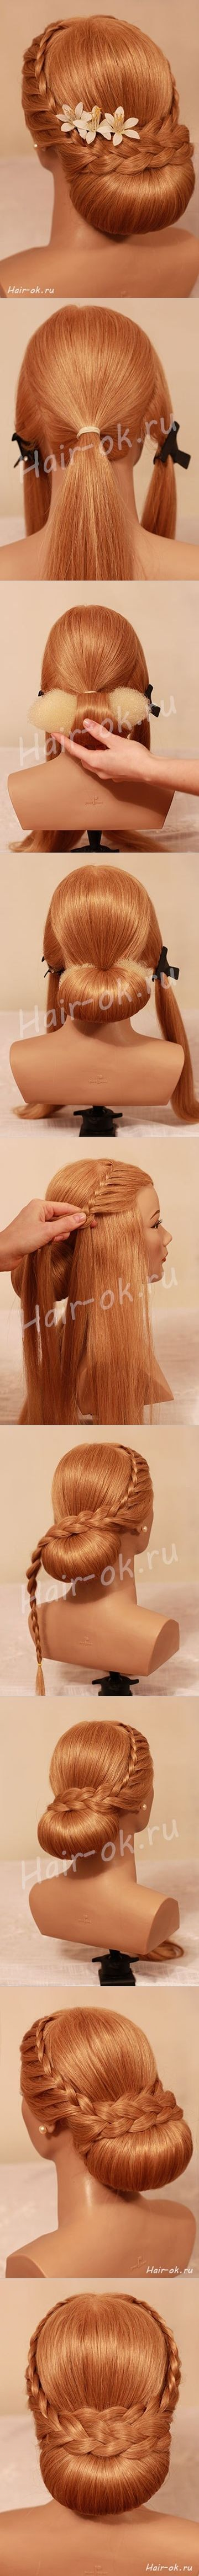 Very elegant braided style!: